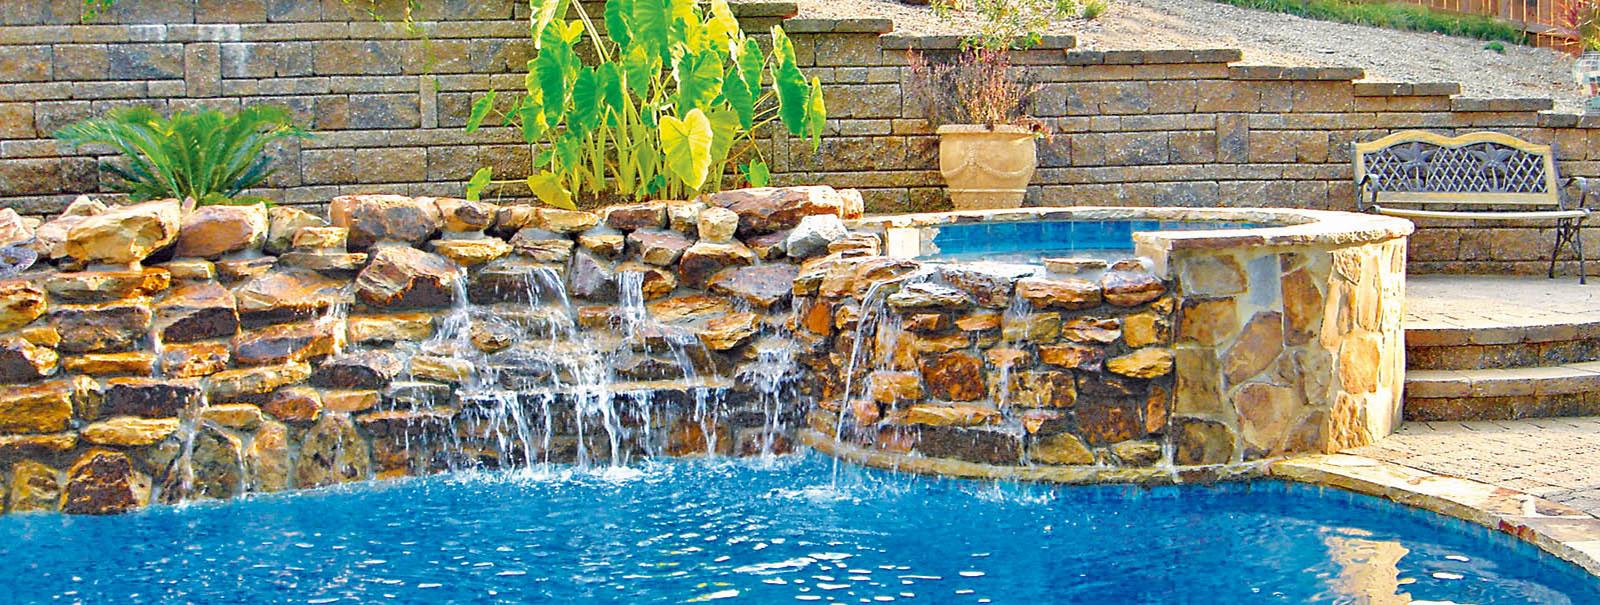 Birmingham-swimming-pool-2